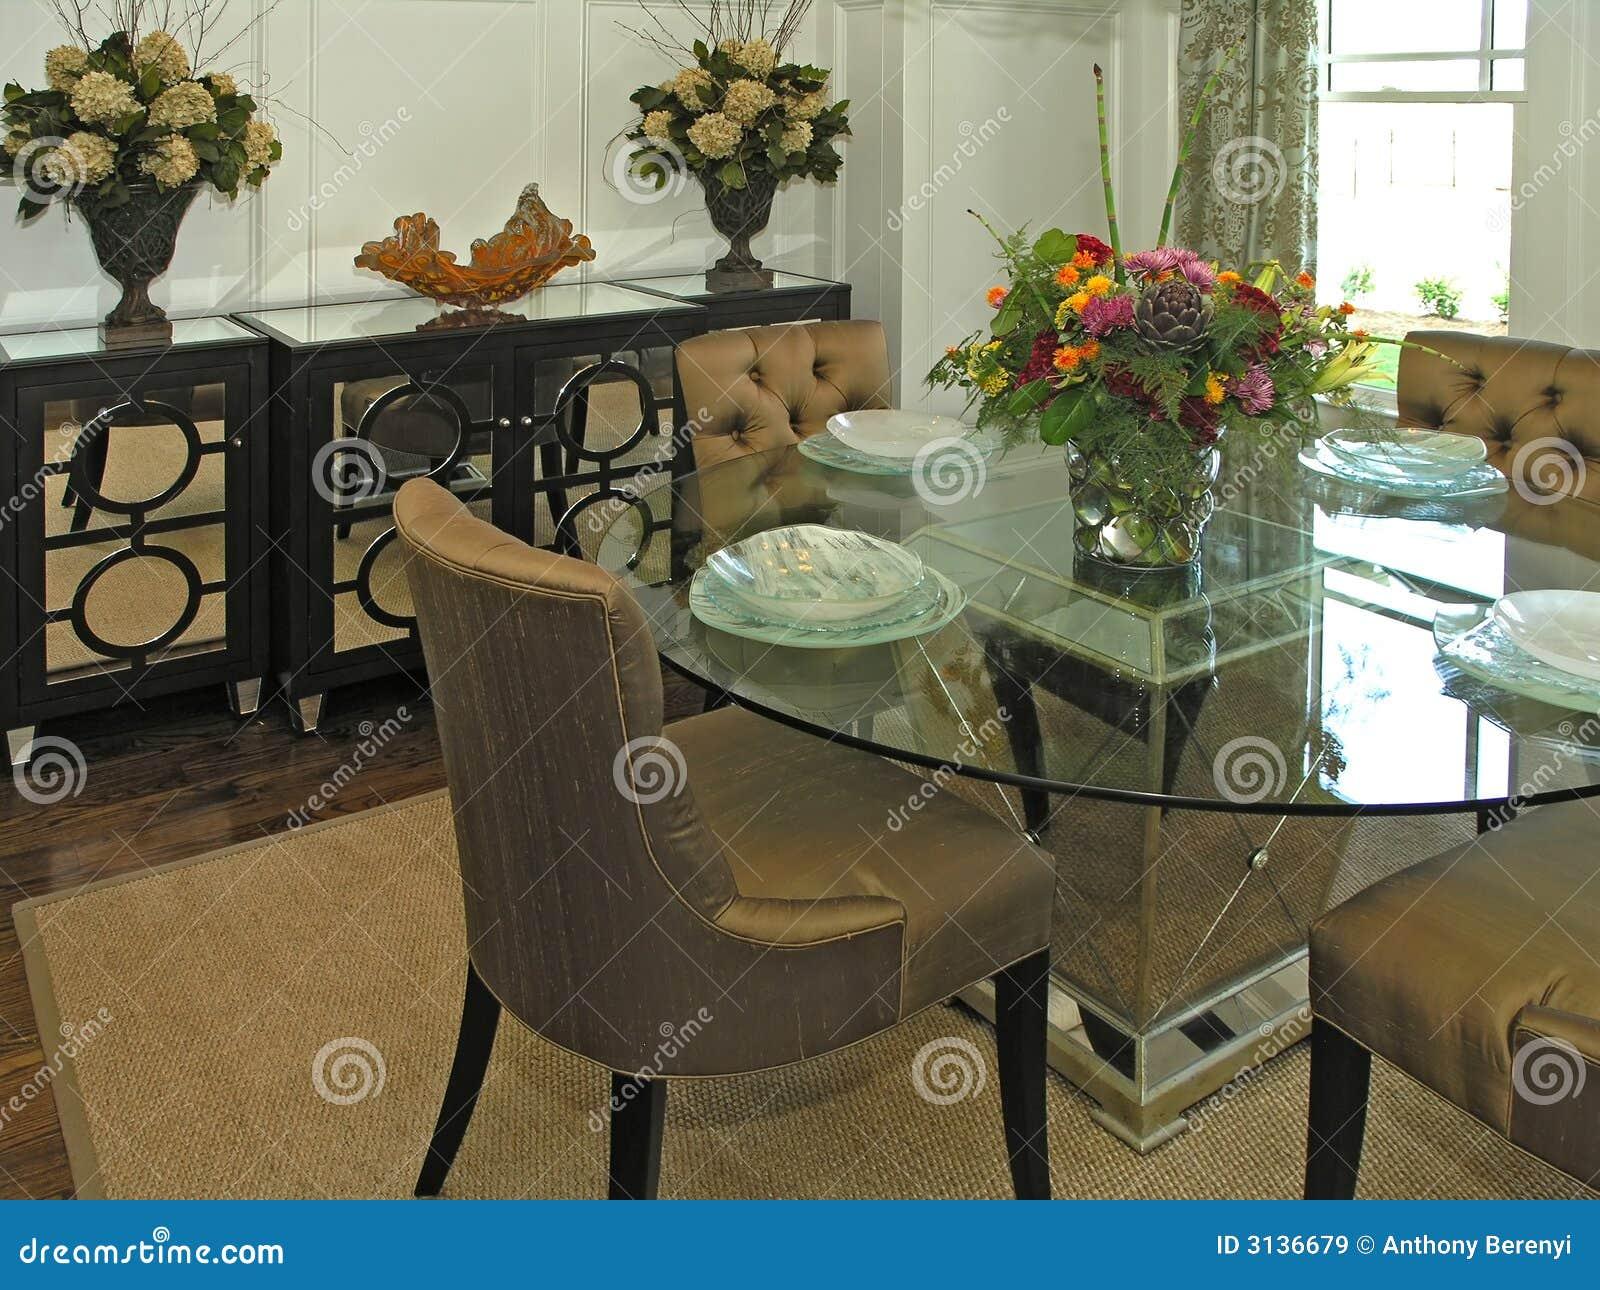 Cadeiras Para Sala De Jantar Luxo ~ Luxo 7  Sala De Jantar 2 Imagens de Stock Royalty Free  Imagem